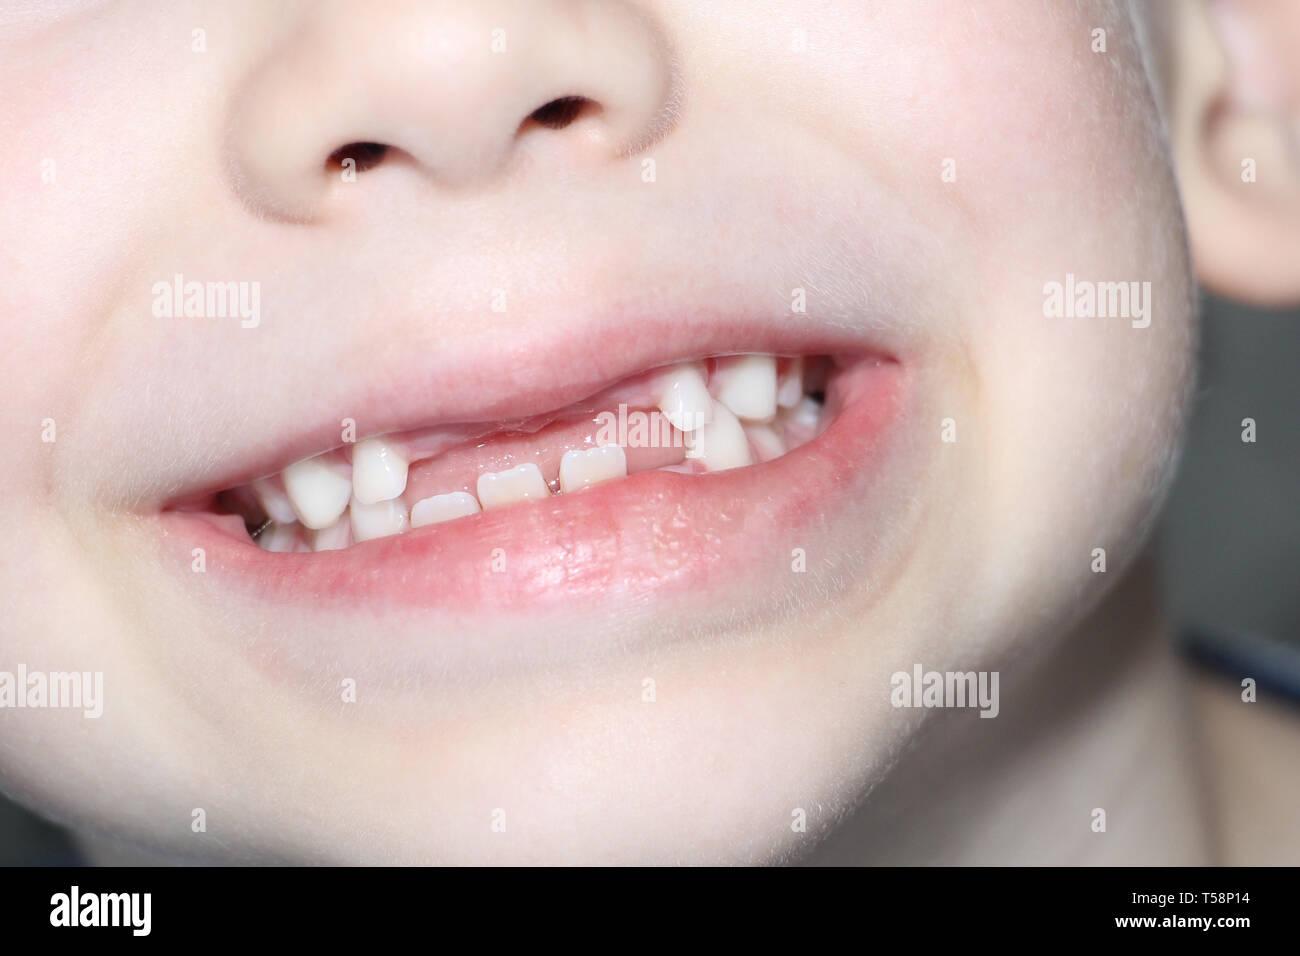 The boy smiles, his milk teeth are visible. Loss of milk teeth. The boy has no upper central teeth. The loss of milk teeth in children. - Stock Image